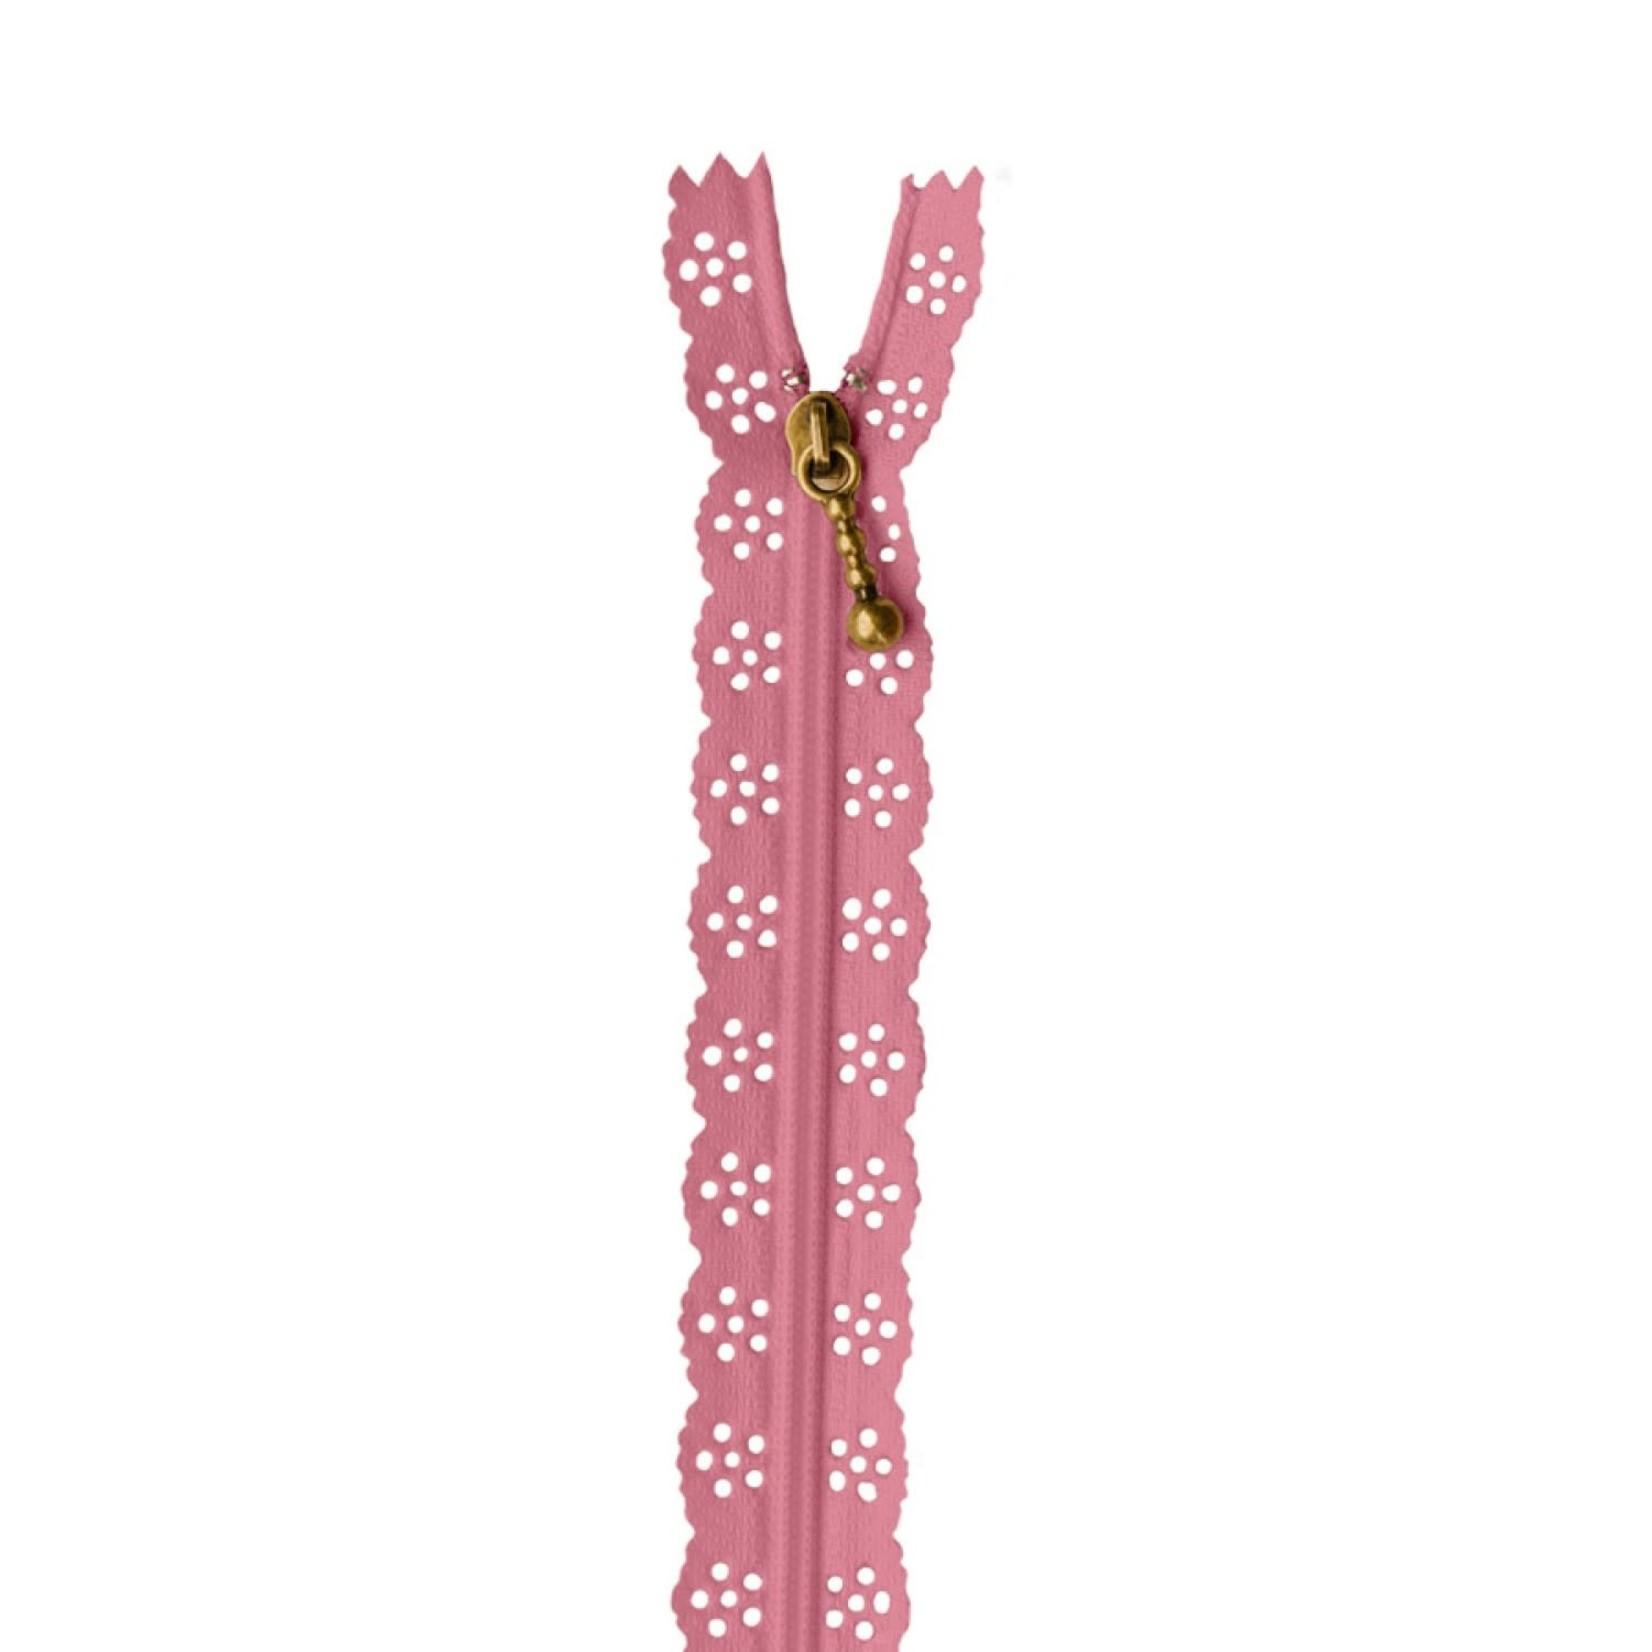 "Kimberbell Designs Lace Zipper 14"" - Flamingo"